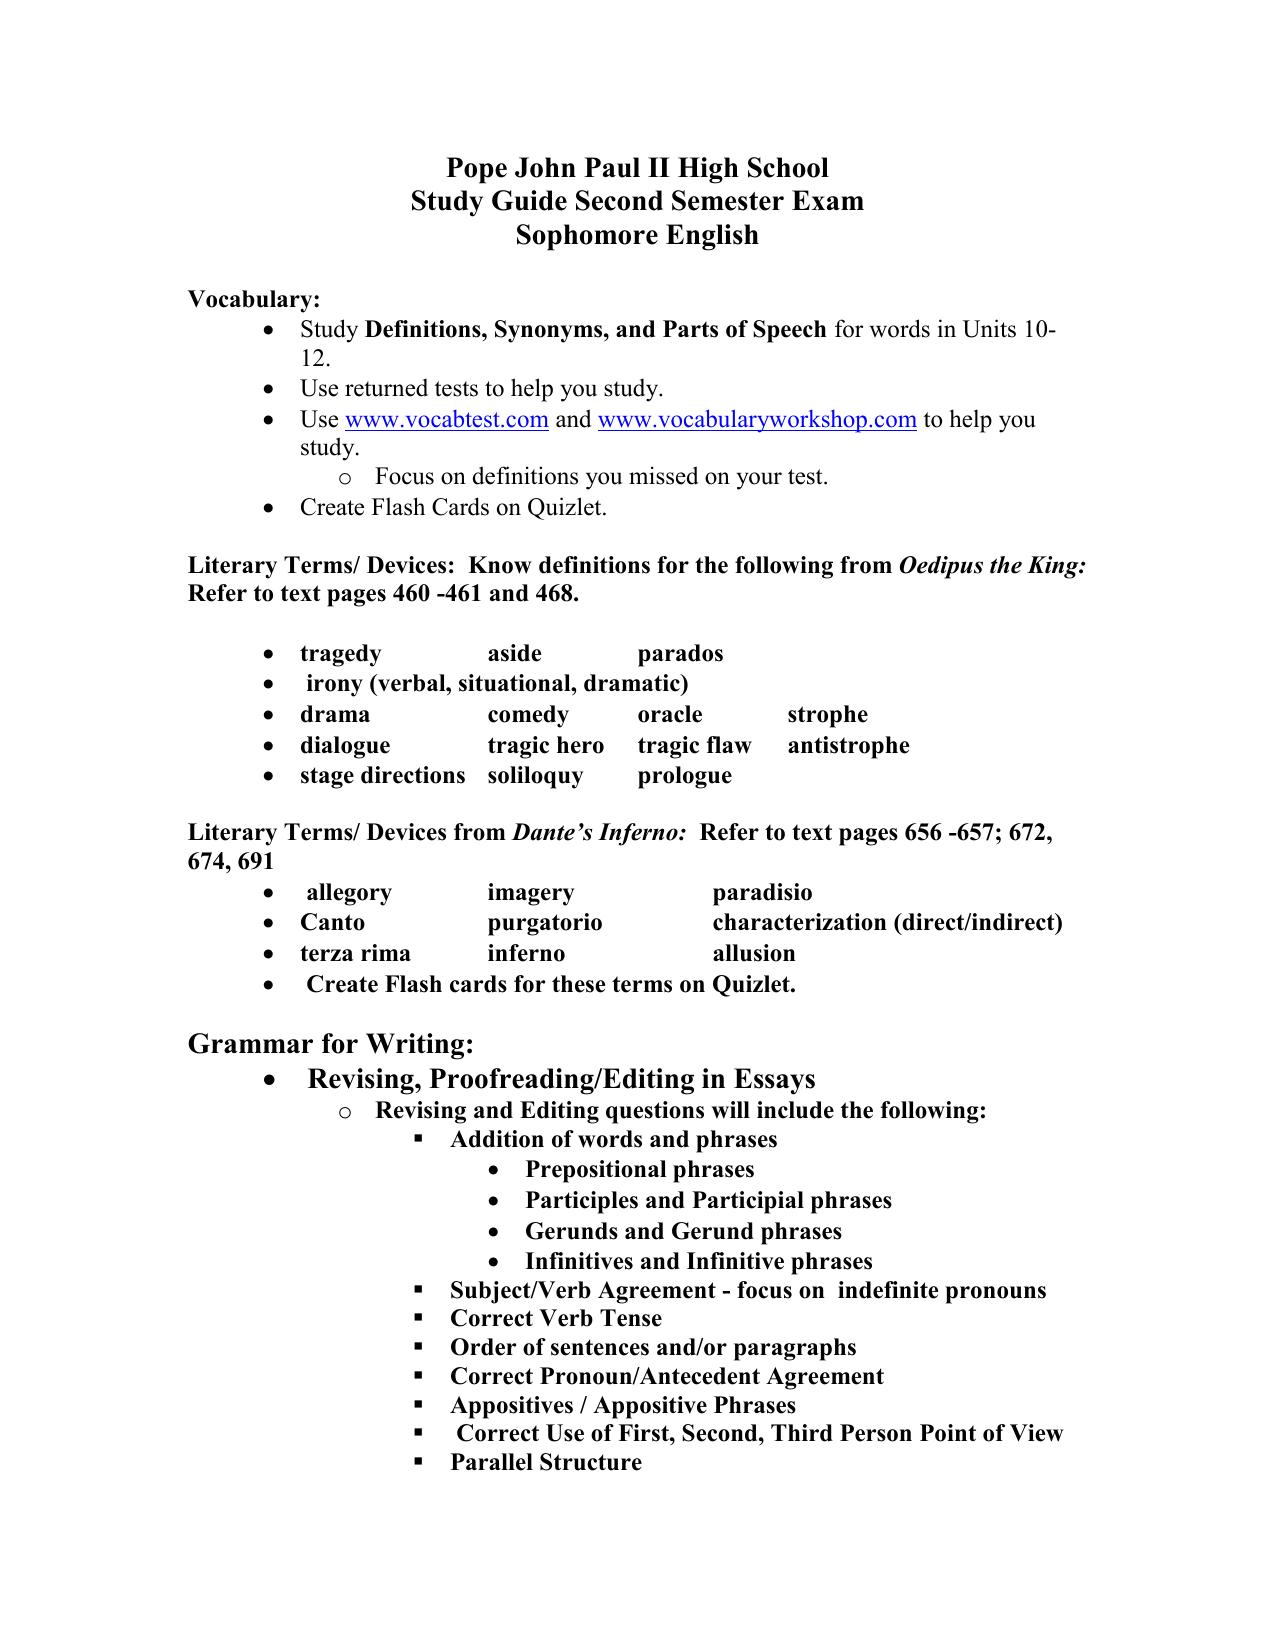 Worksheet Subject Verb And Pronoun Antecedent Agreement Worksheets